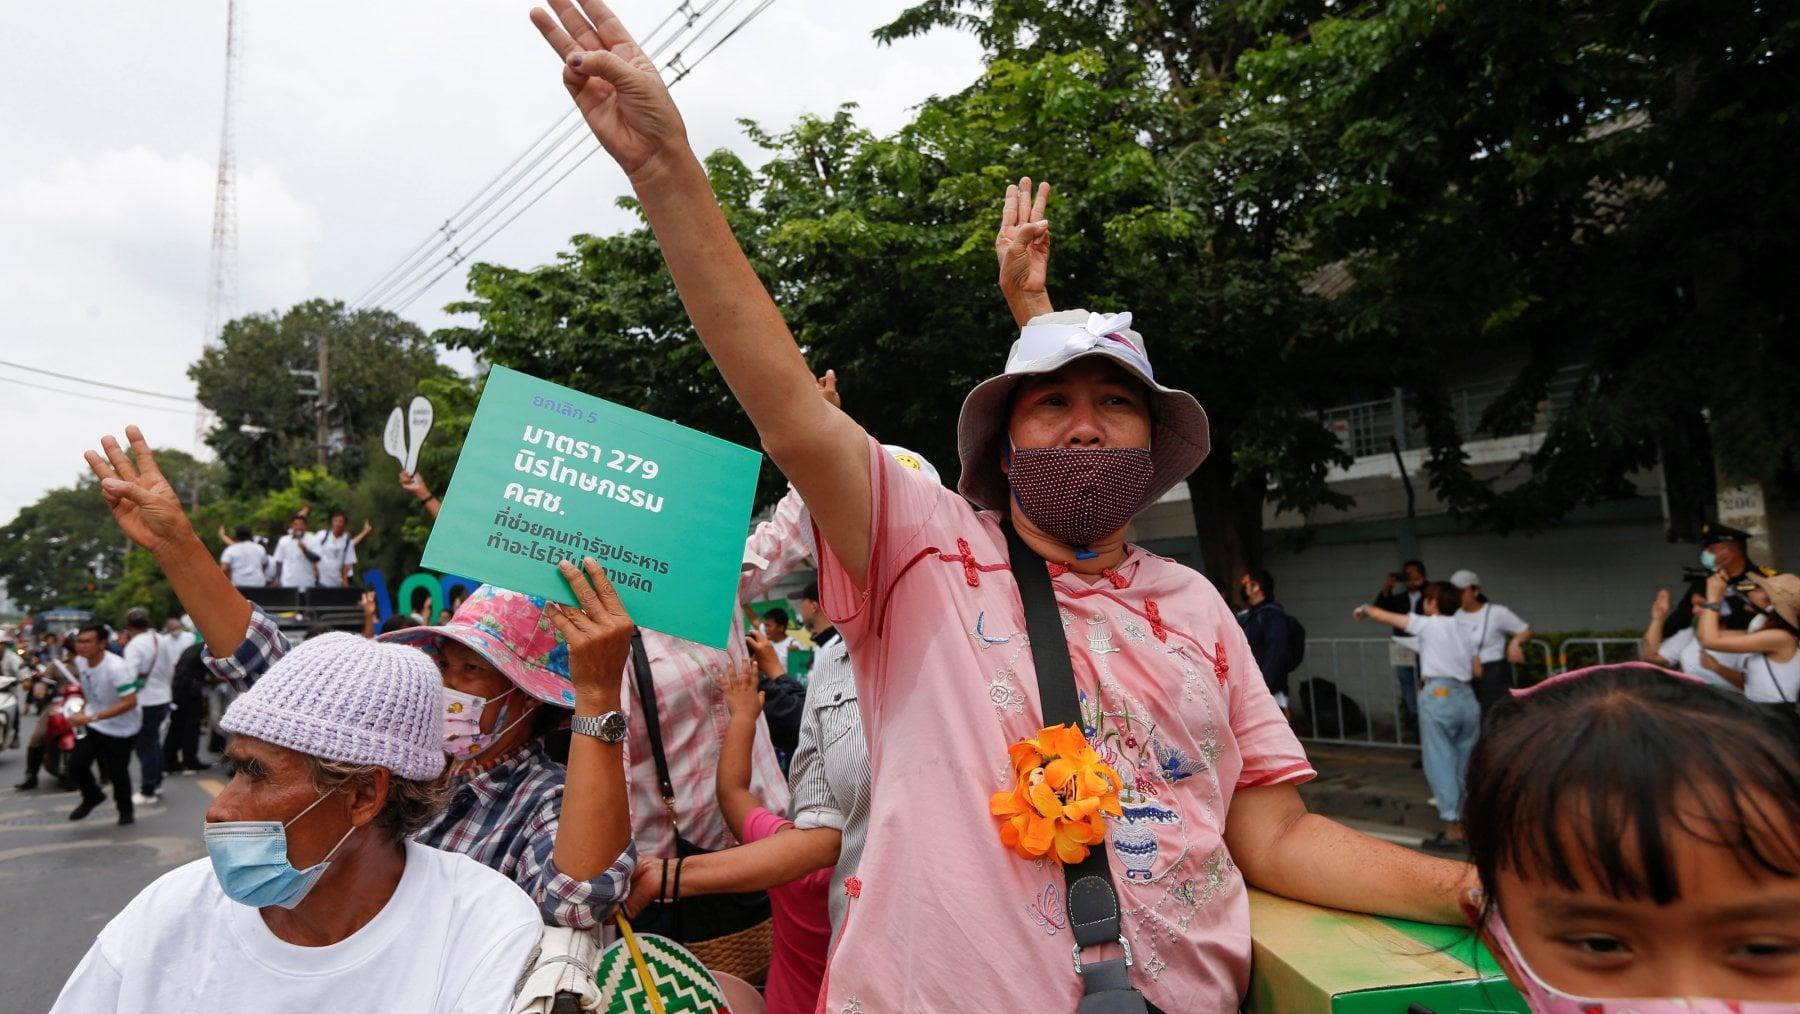 181710510 d932b6f0 2793 4049 9543 63b6fc9579d6 - Thailandia, pugno di ferro del regime contro i manifestanti